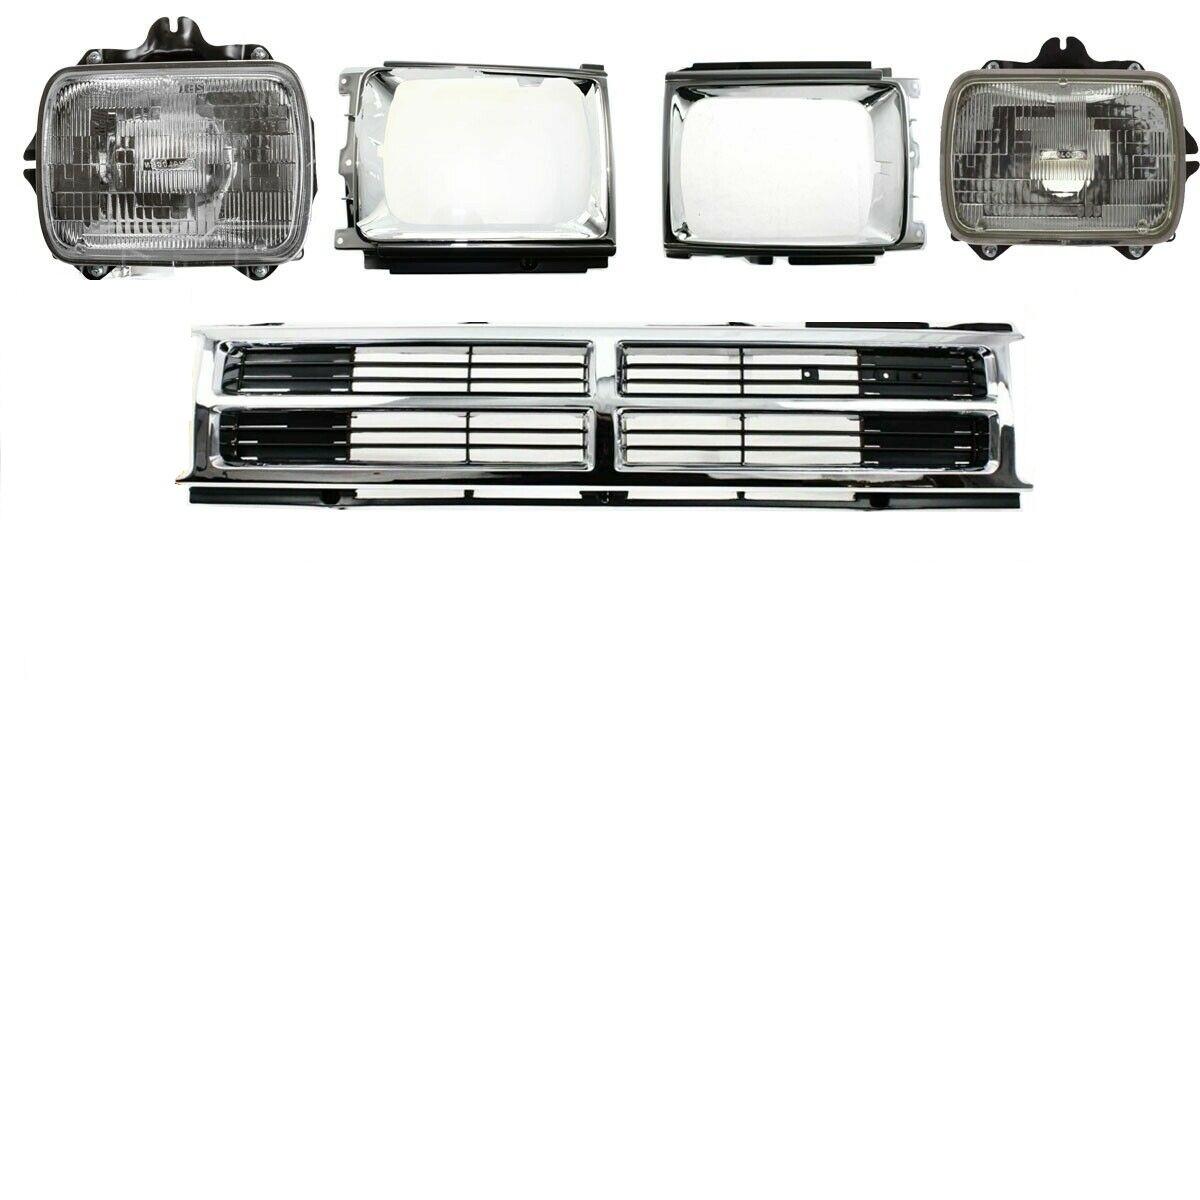 Grade Farol Porta Dianteira Toyota Pickup 87 88 To2512107 To2513109 To1200133 Ebay